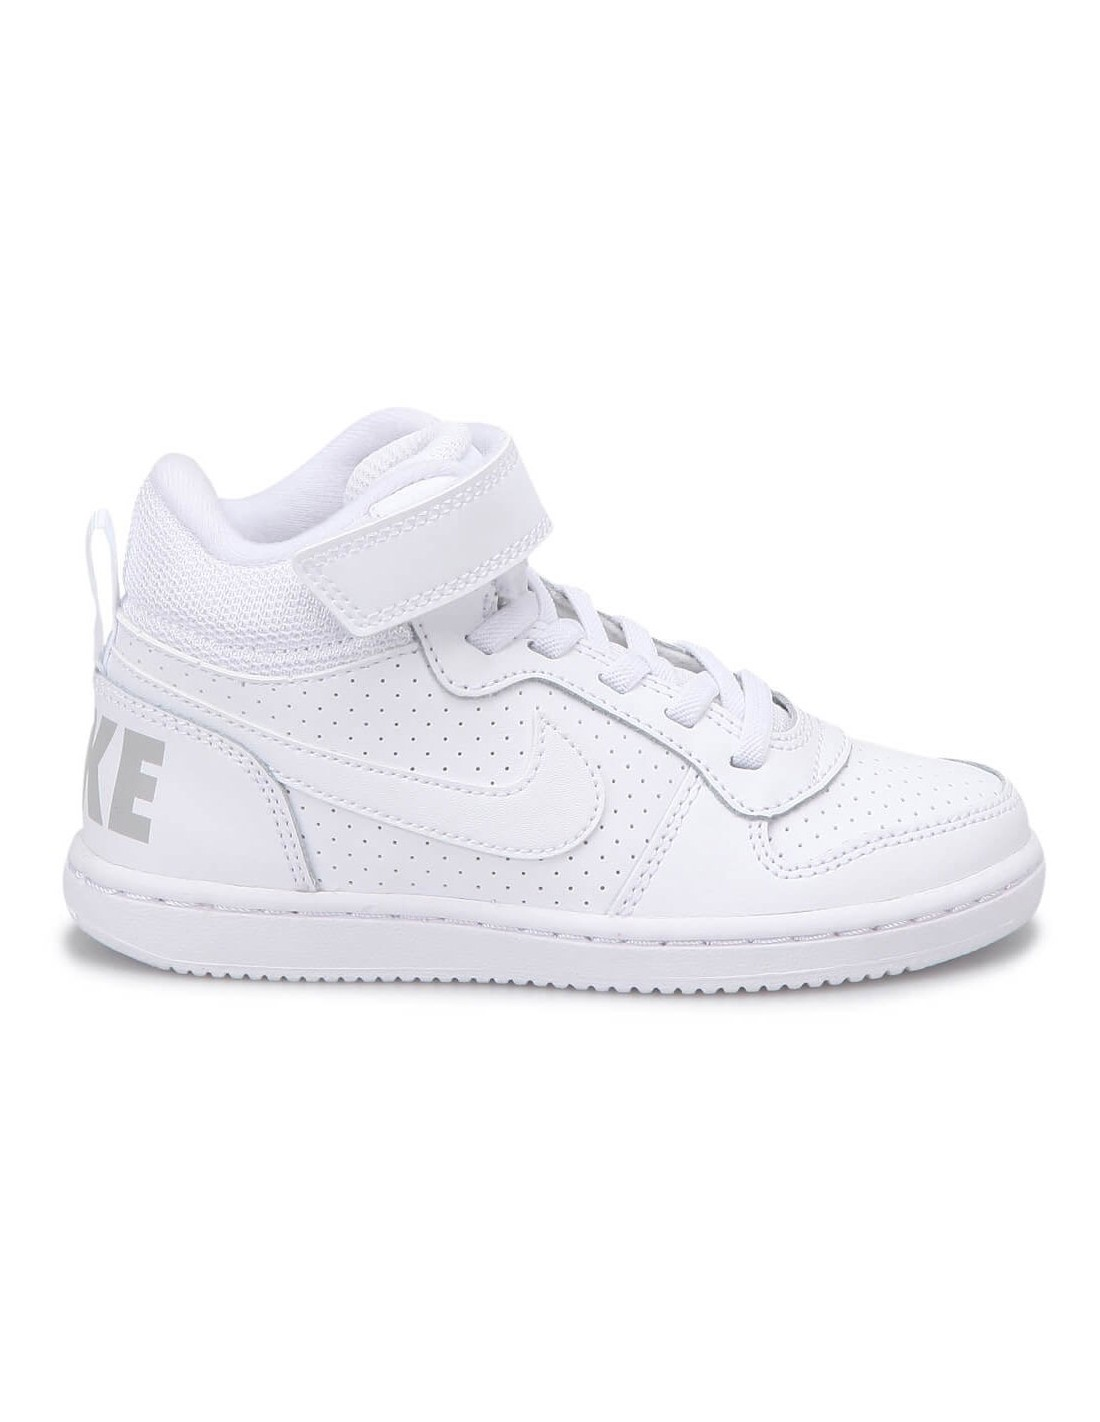 Scarpe Nike Court Borough Mid bambino bambina bianco